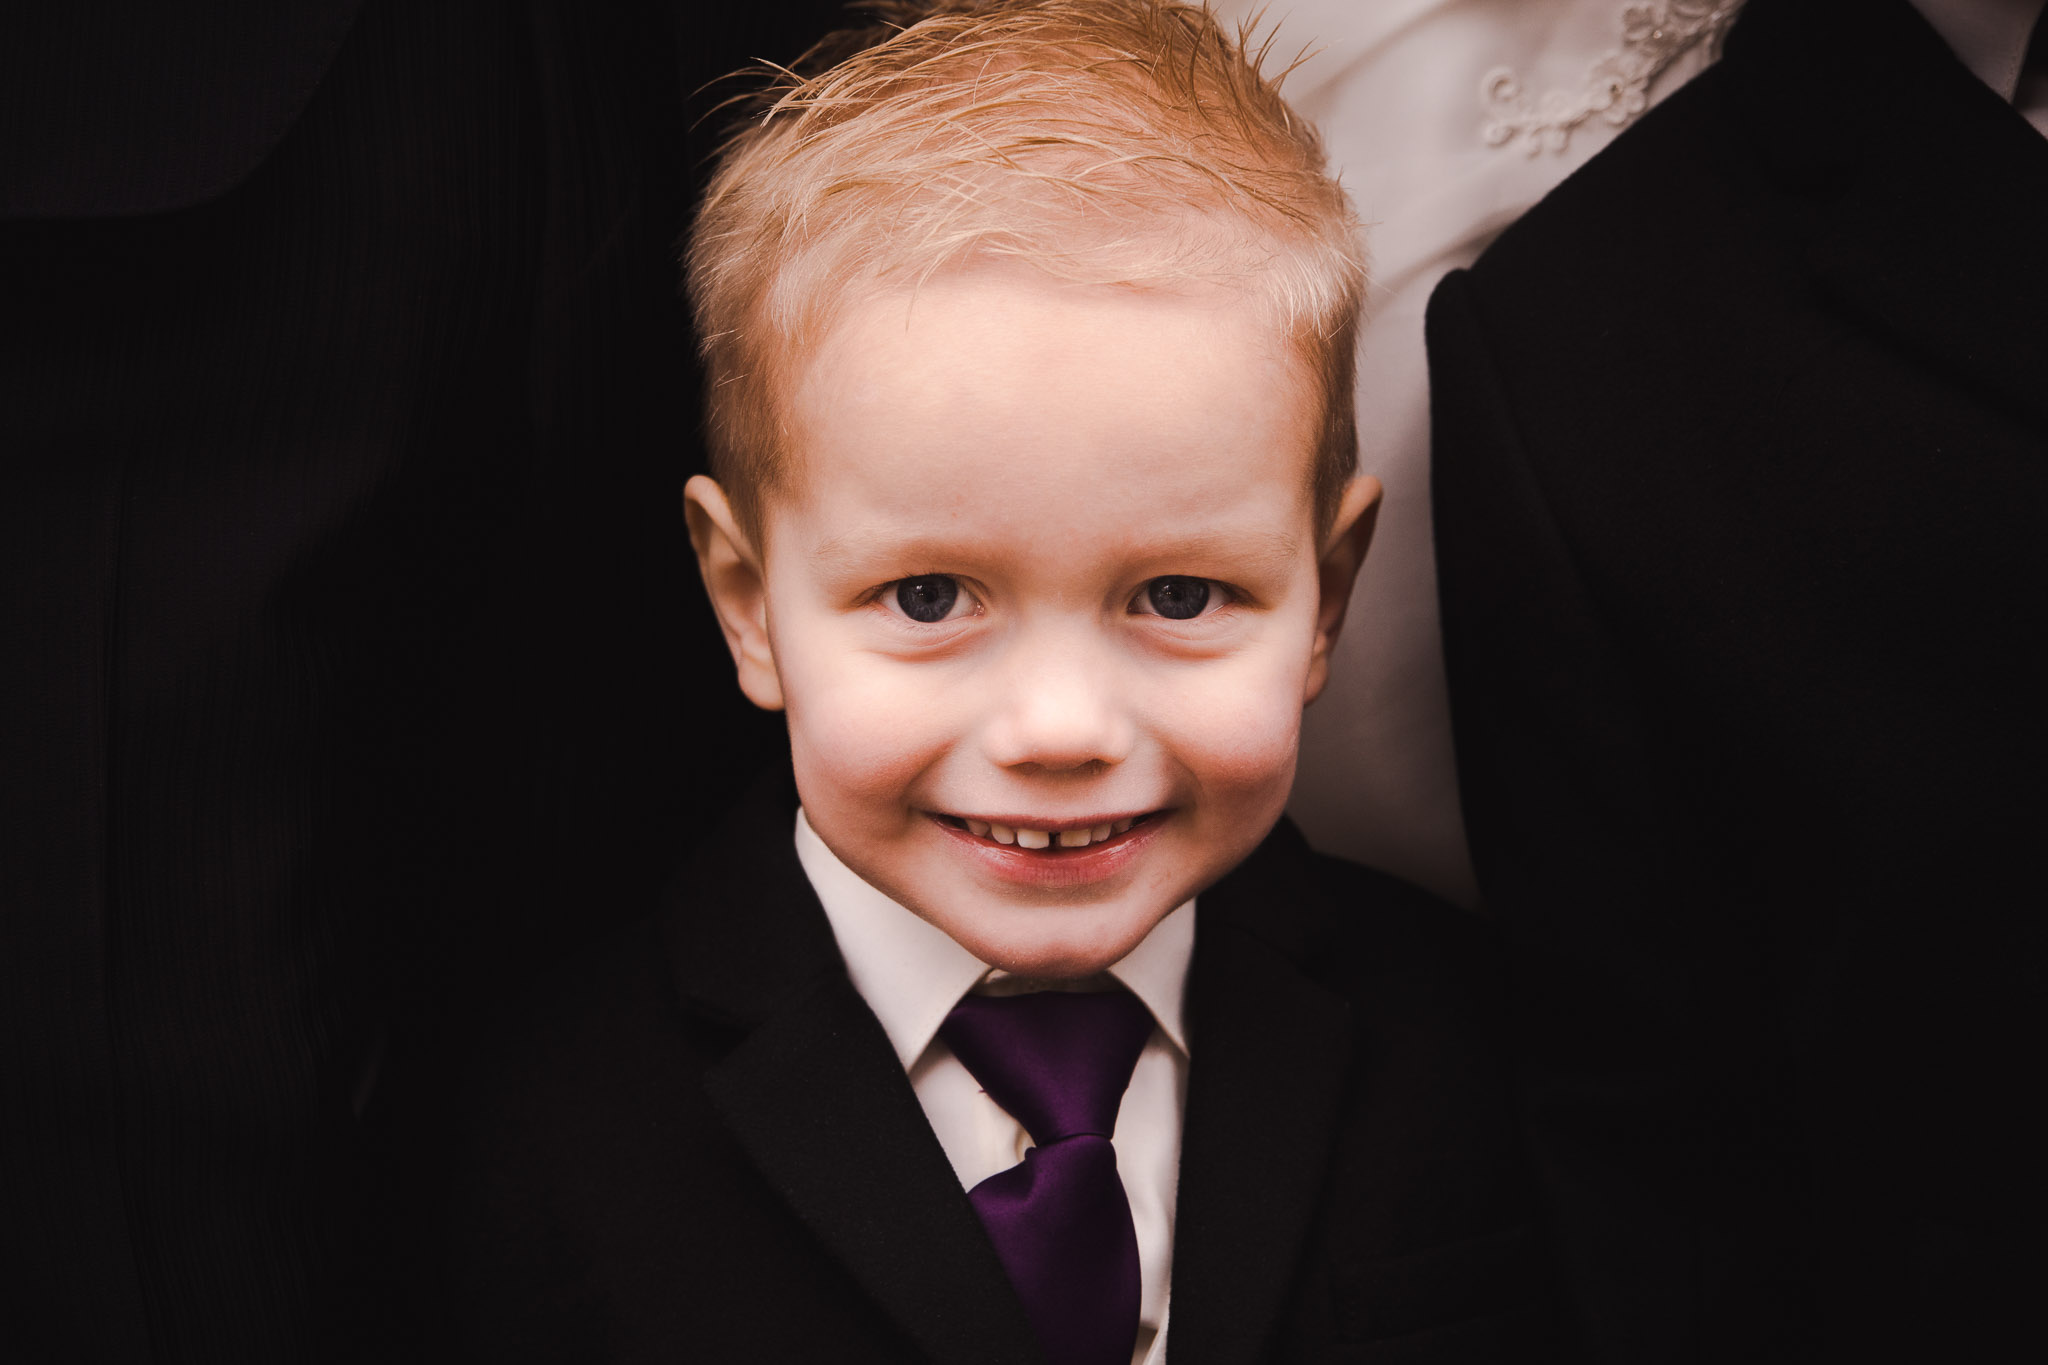 bruiloft veendam reportage anouk hilko zoontje portret